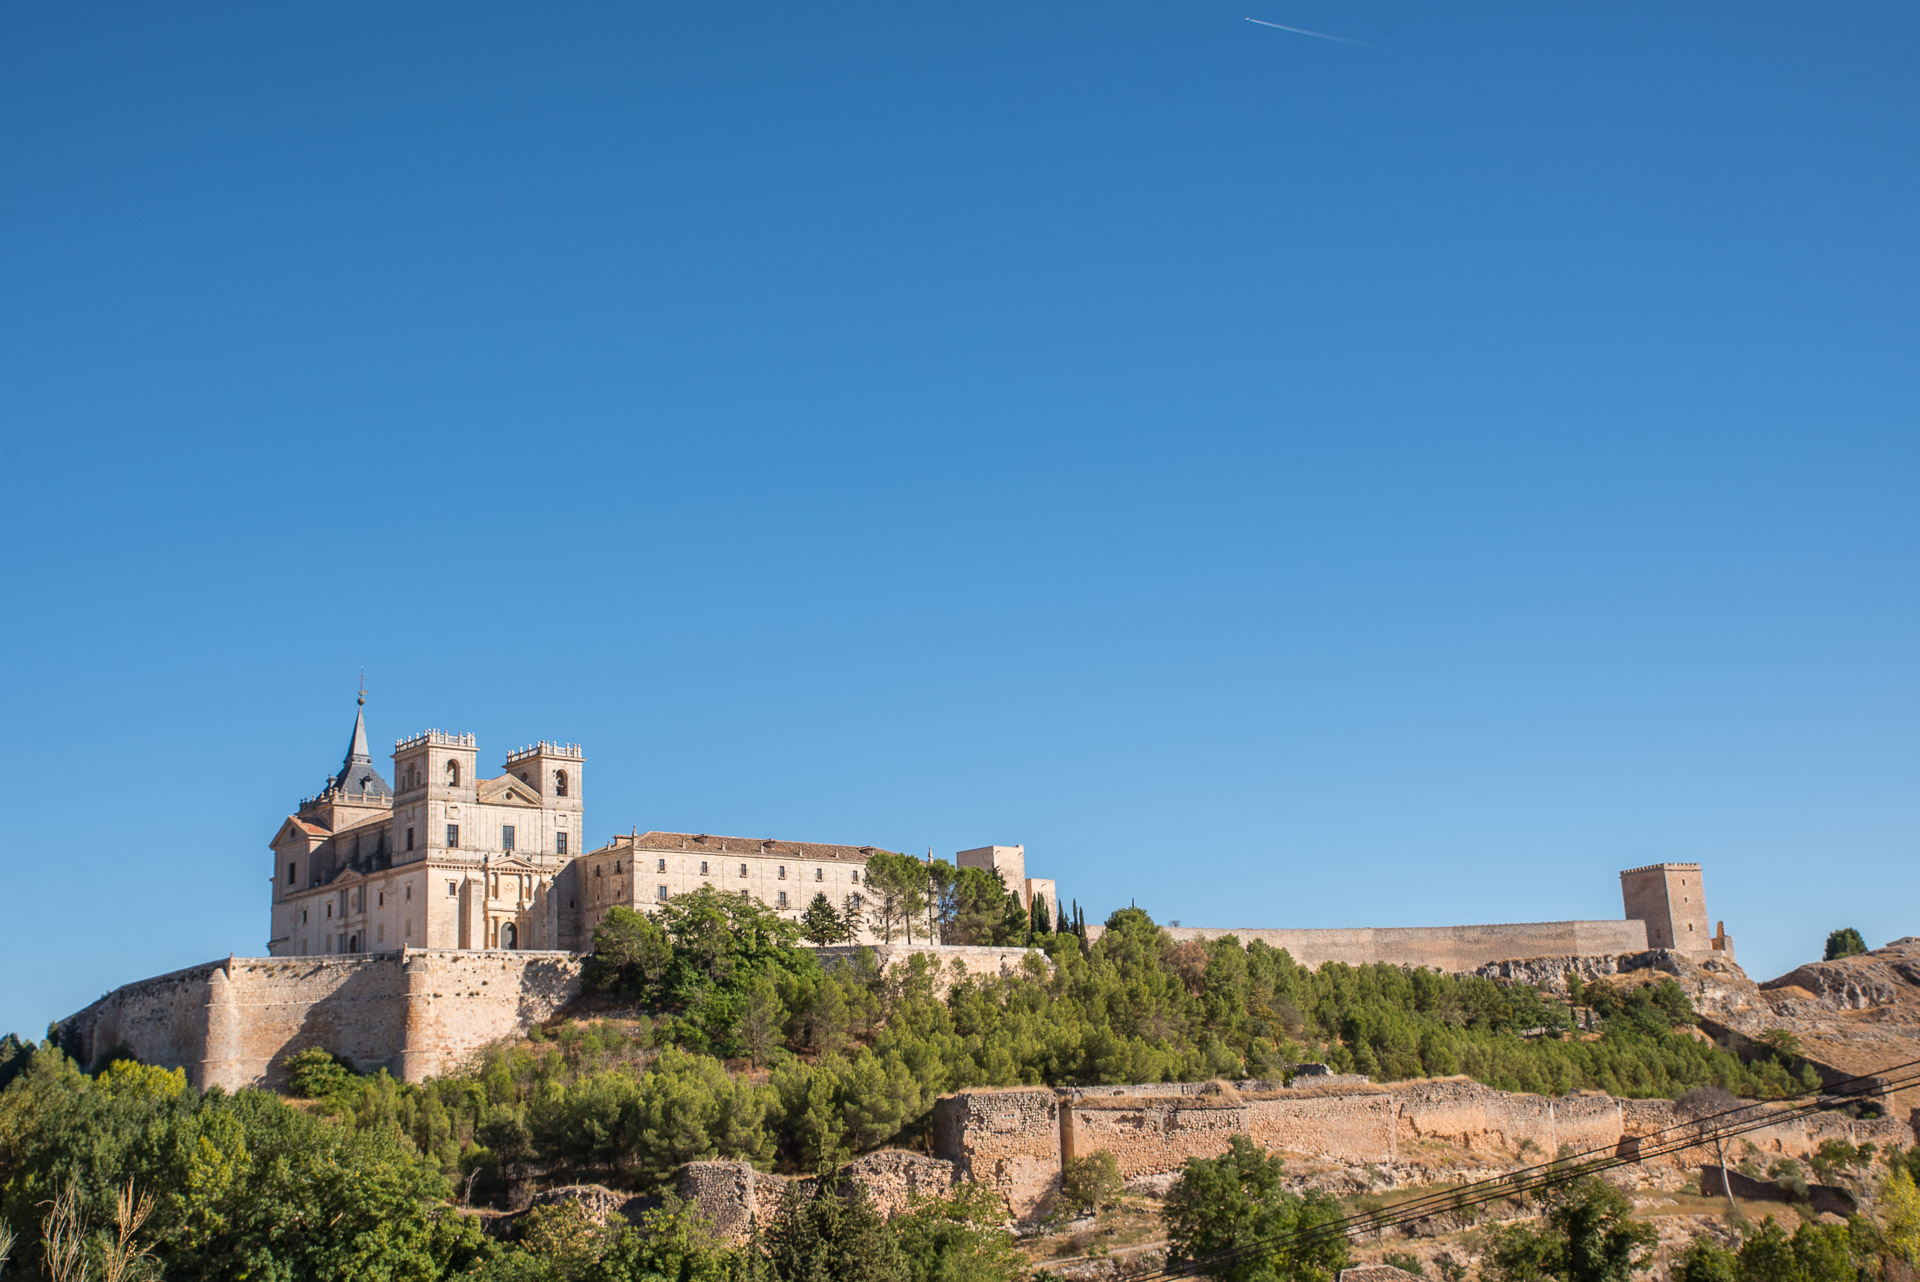 monasterio-de-ucles04.jpg